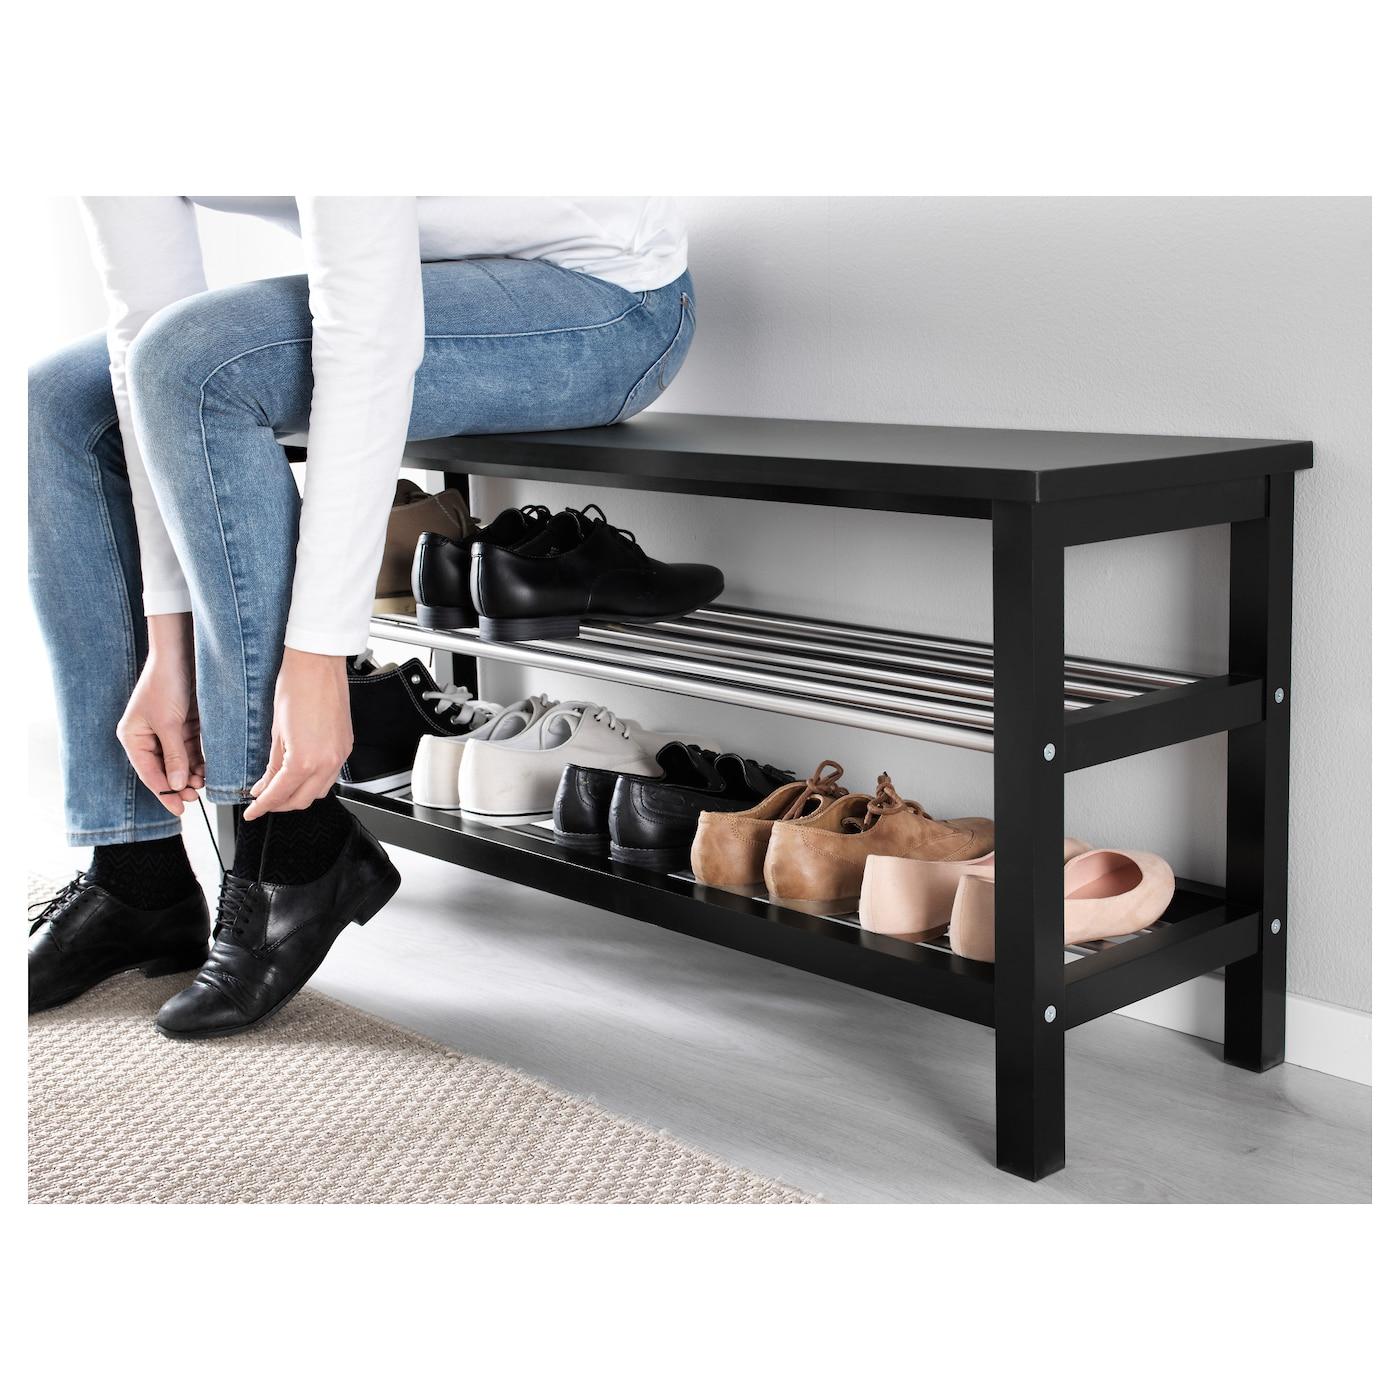 tjusig banc avec rangement chaussures noir 108 x 50 cm ikea. Black Bedroom Furniture Sets. Home Design Ideas